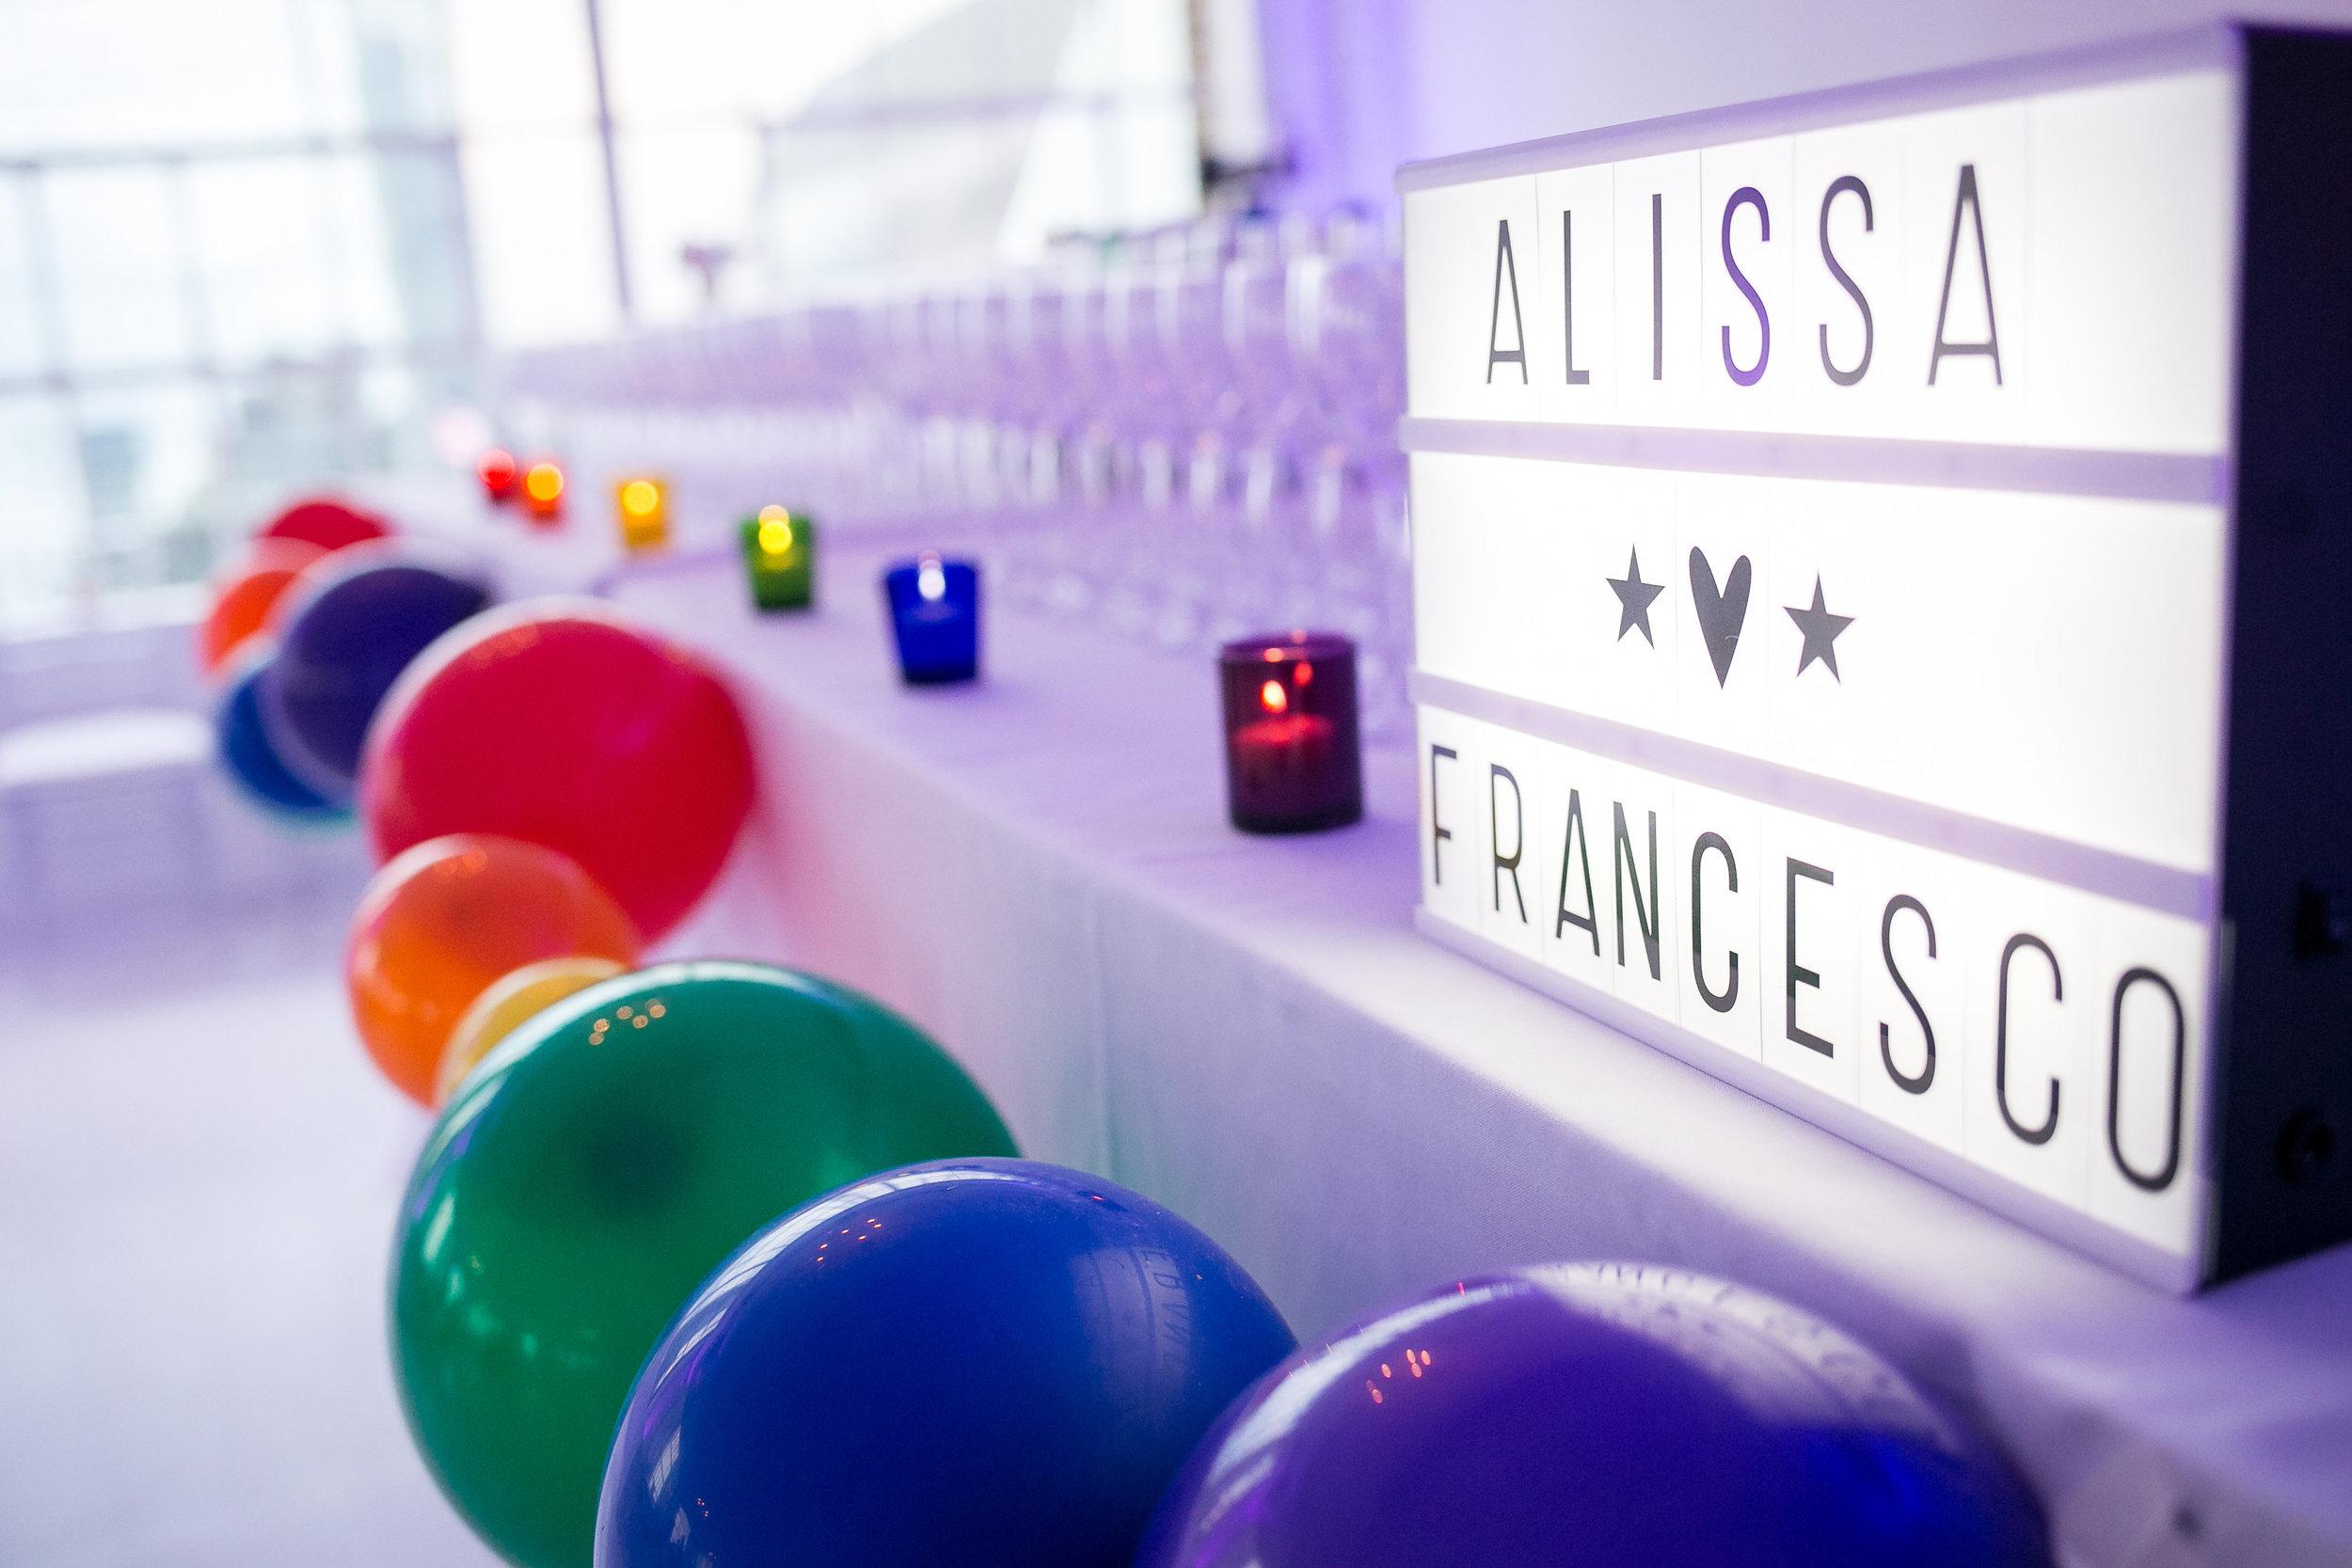 alissa and francesco 4-0830.jpg